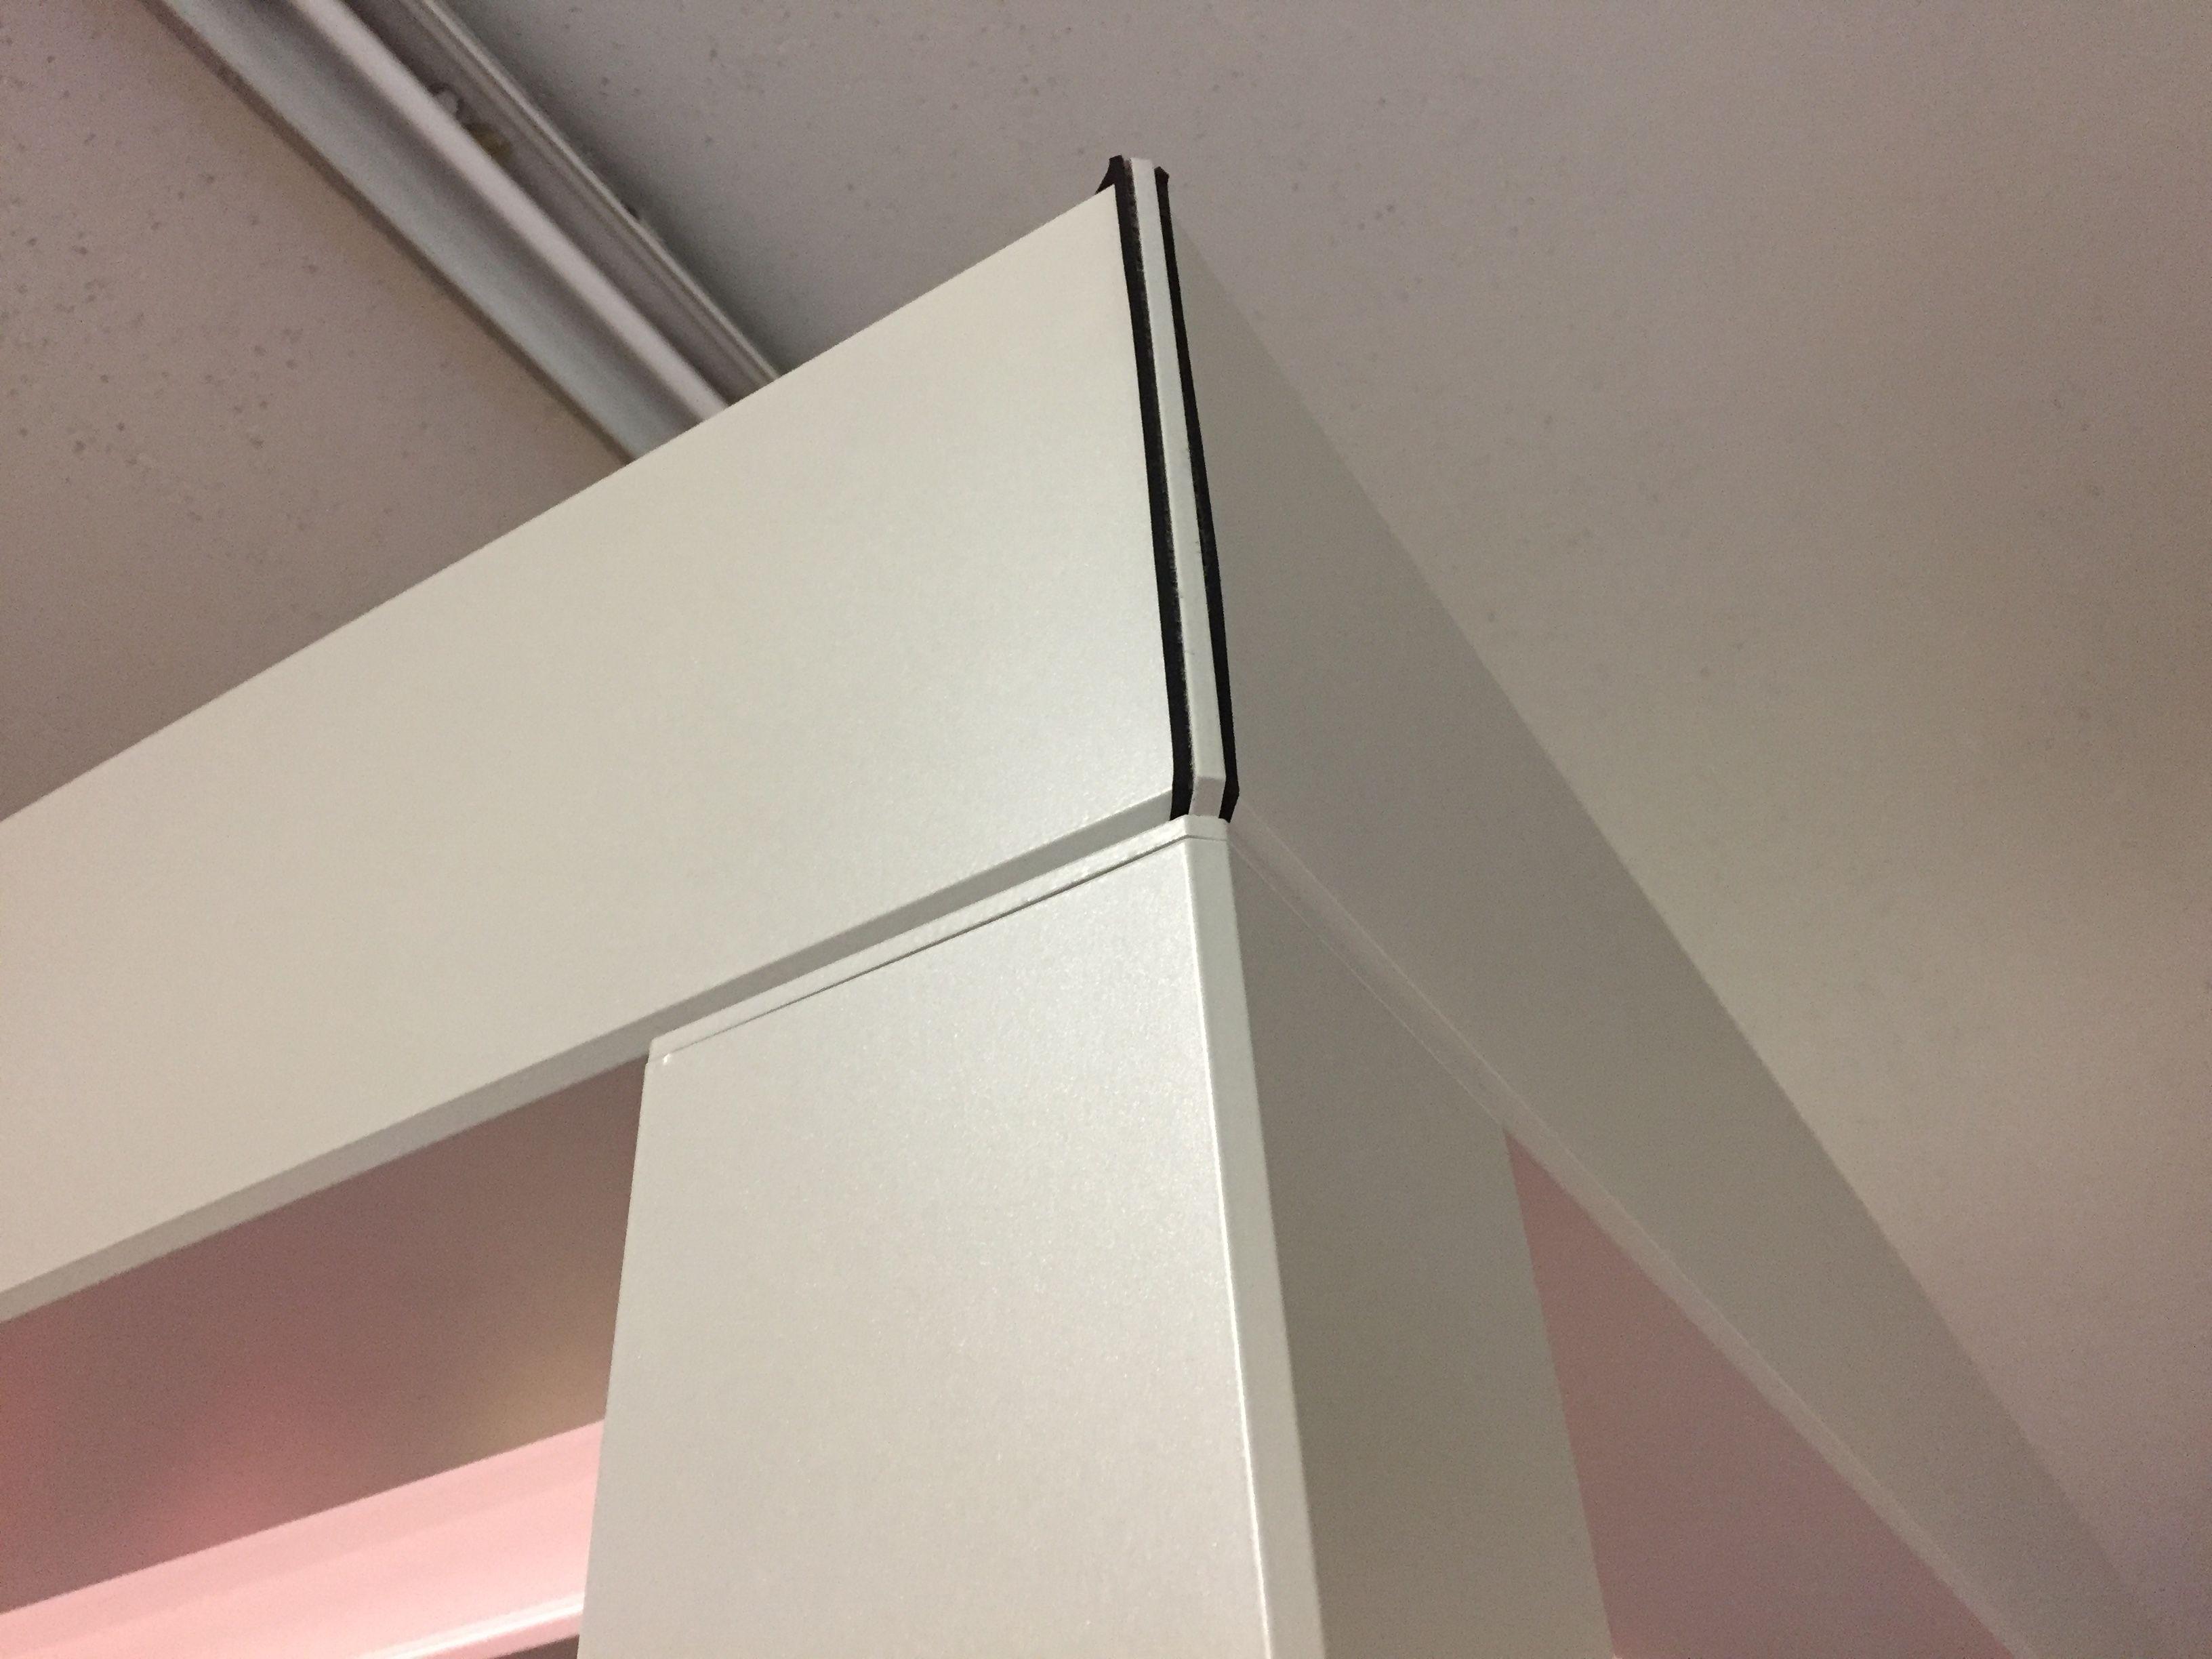 rolladenbauer stuttgart icnib. Black Bedroom Furniture Sets. Home Design Ideas